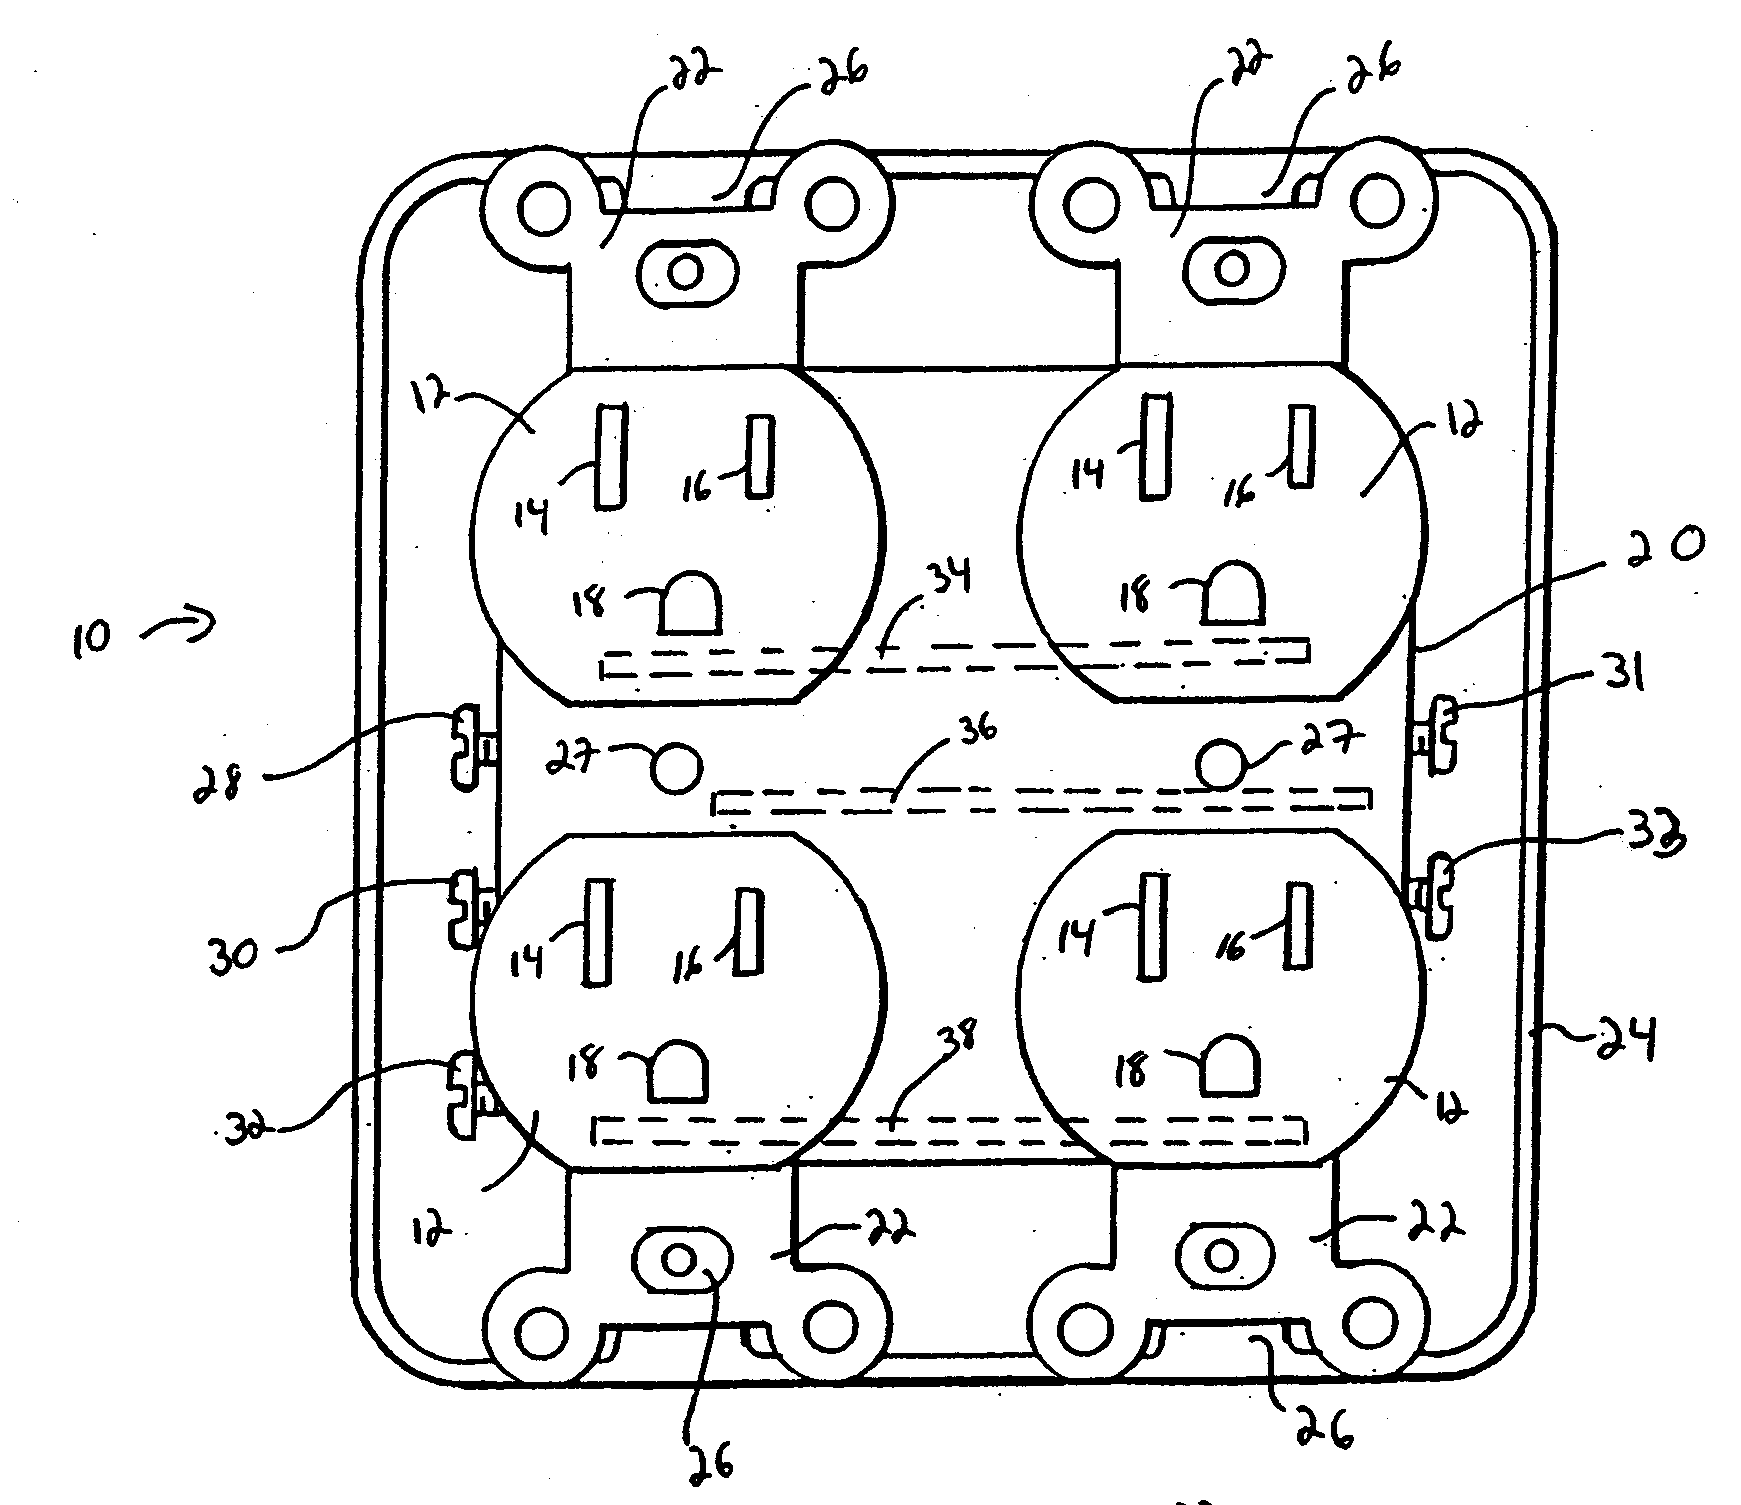 double duplex outlet wiring diagram for split ac unit patent us20080188121 modular electrical receptacle